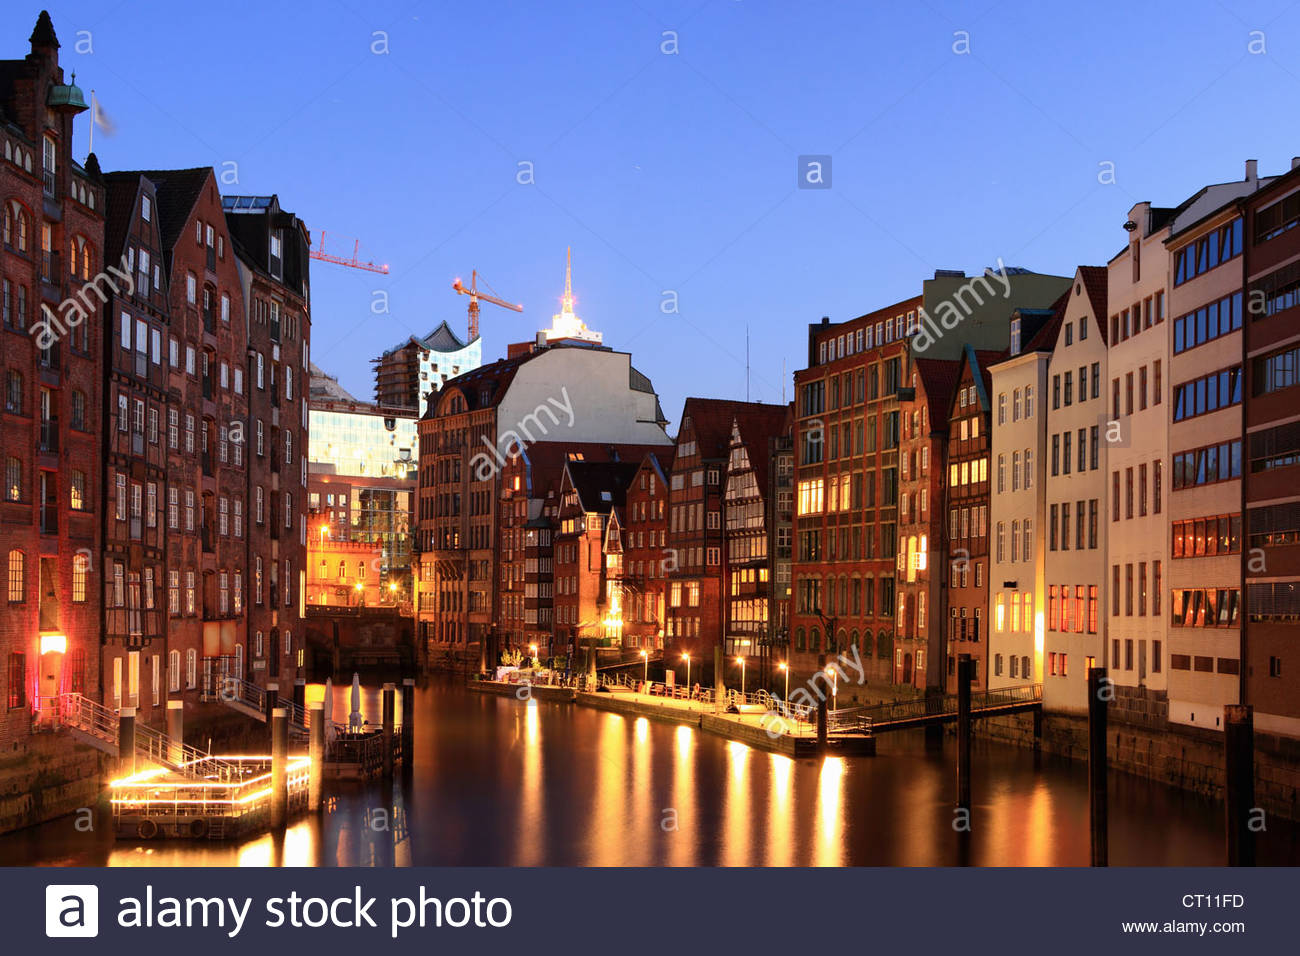 Hamburg lit up at night - Stock Image